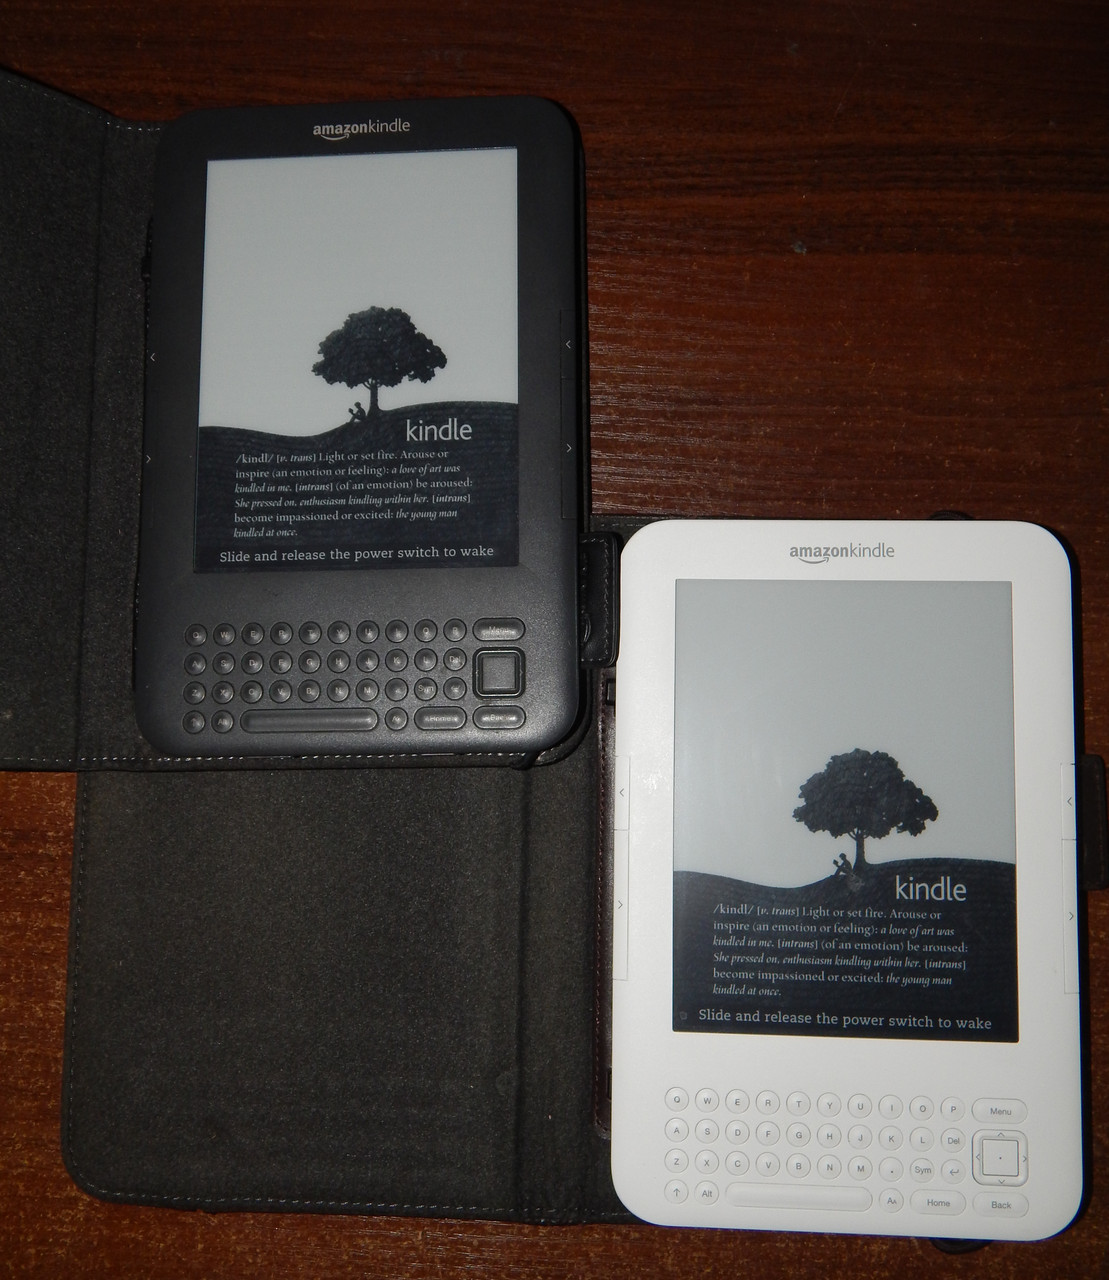 Электронная книга Amazon Kindle 3 Wi-Fi Keyboard d00901